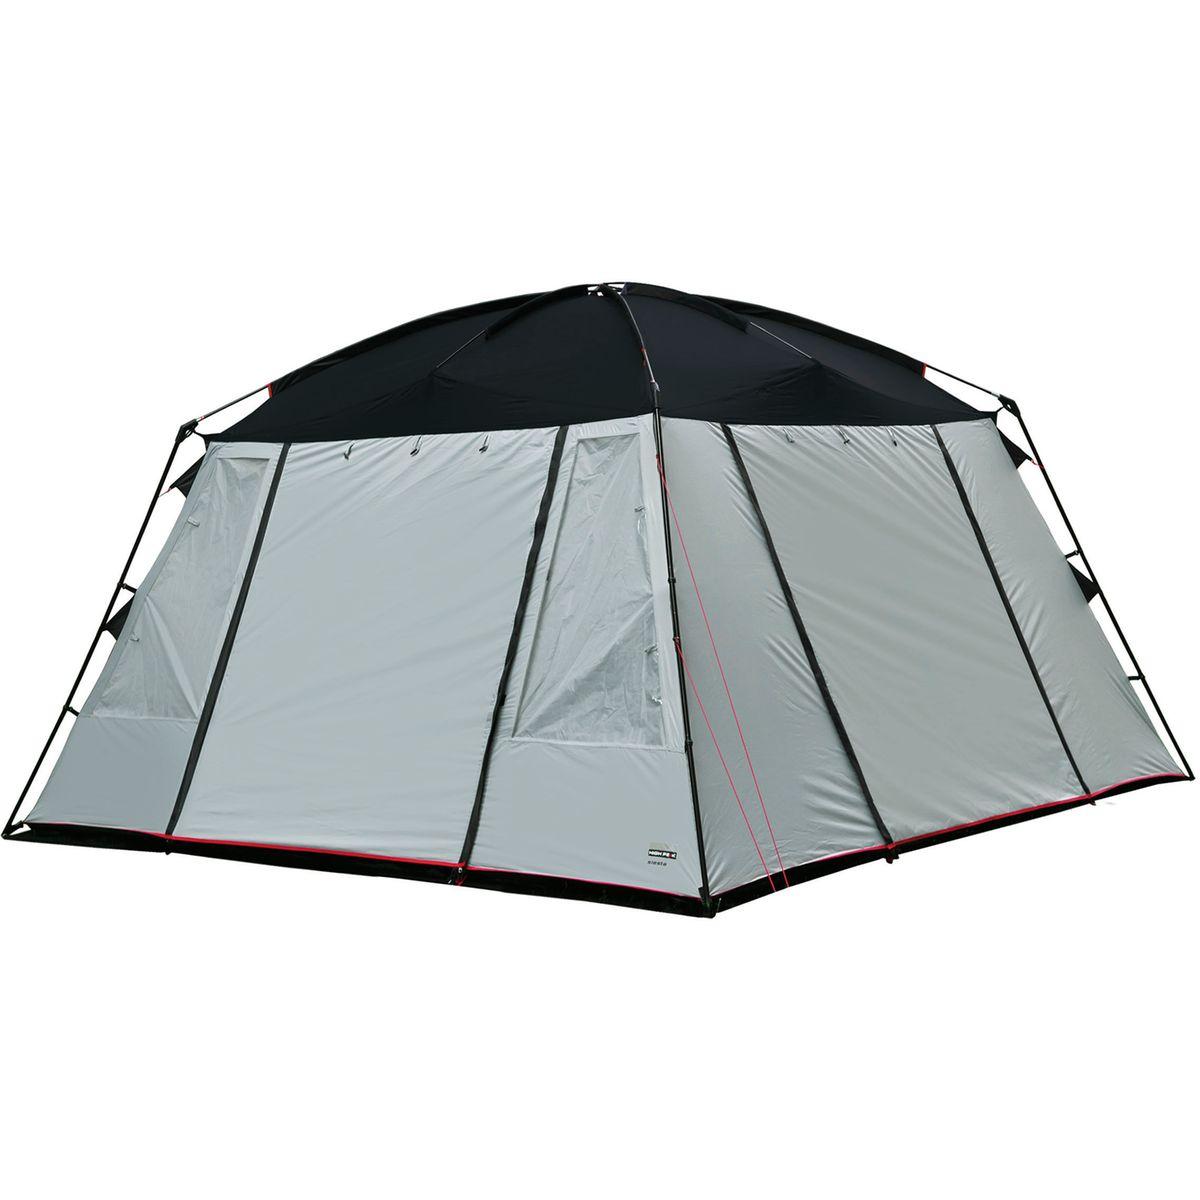 Siesta Tente De Reception Gris Taille Taille Unique In 2019 Products Tente Reception Tentes Reception